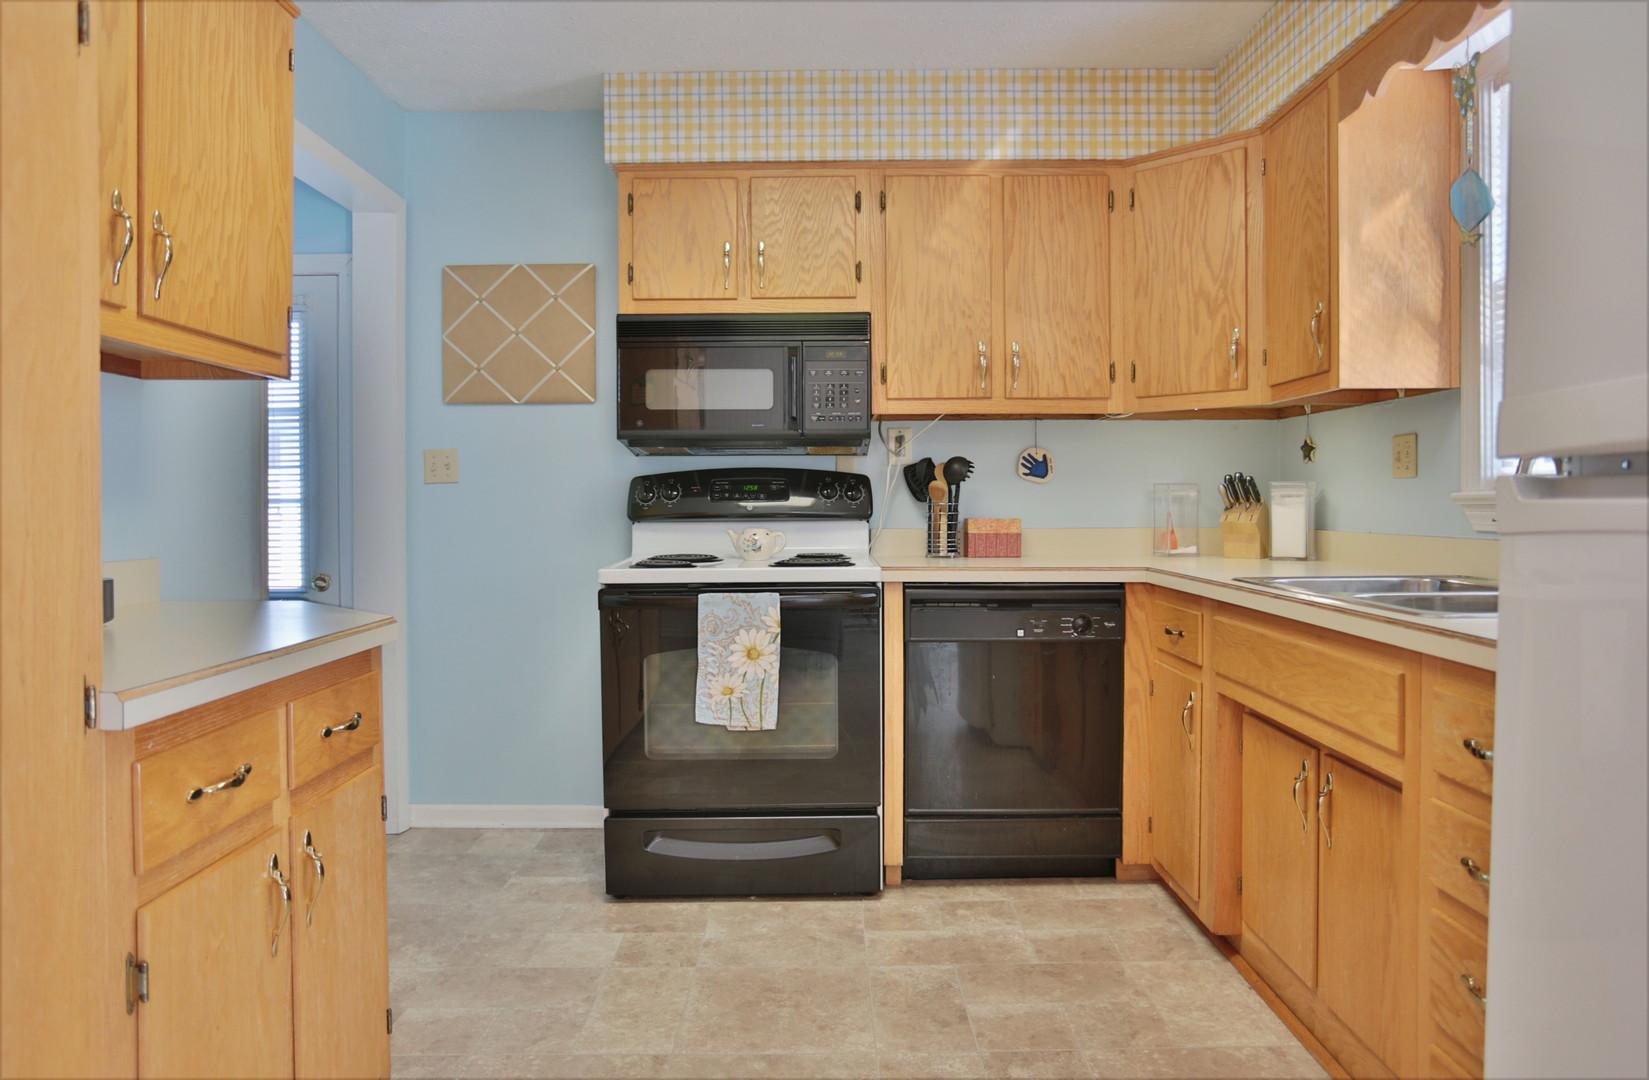 11413 Flowervale Lane Louisville, KY 40272 Kitchen